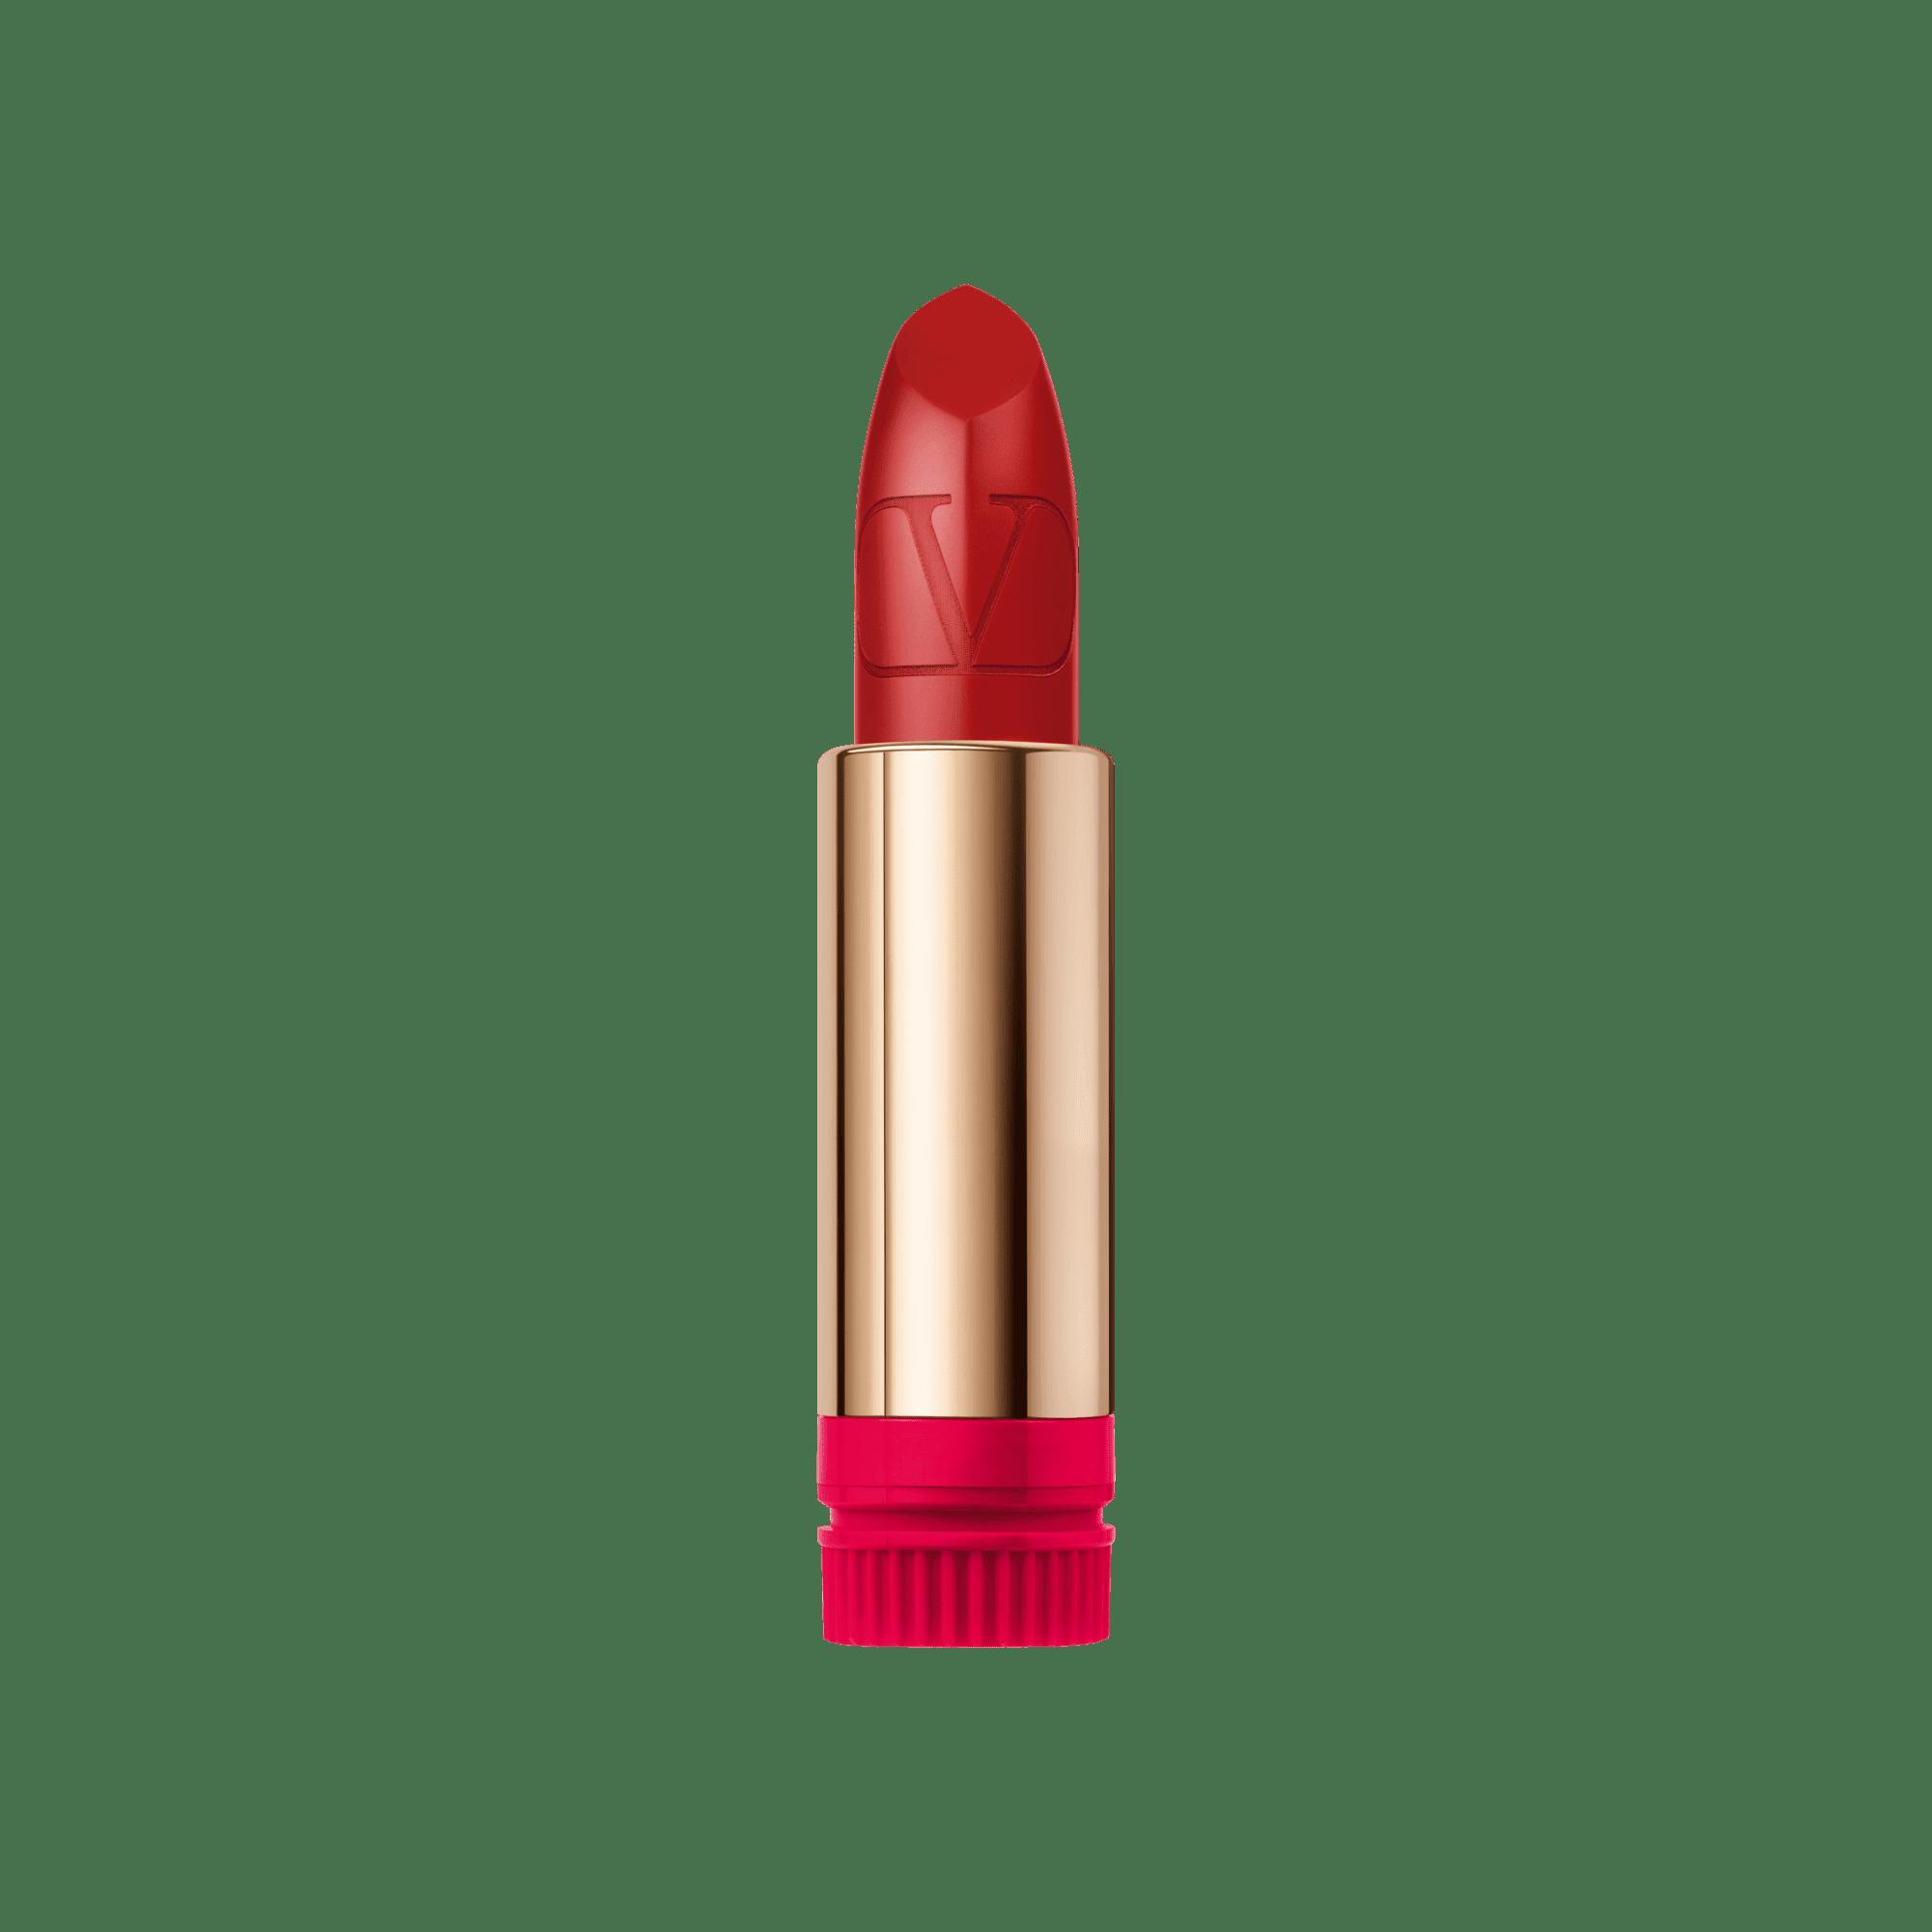 Valentino maquillage rouge à lèvres recharge